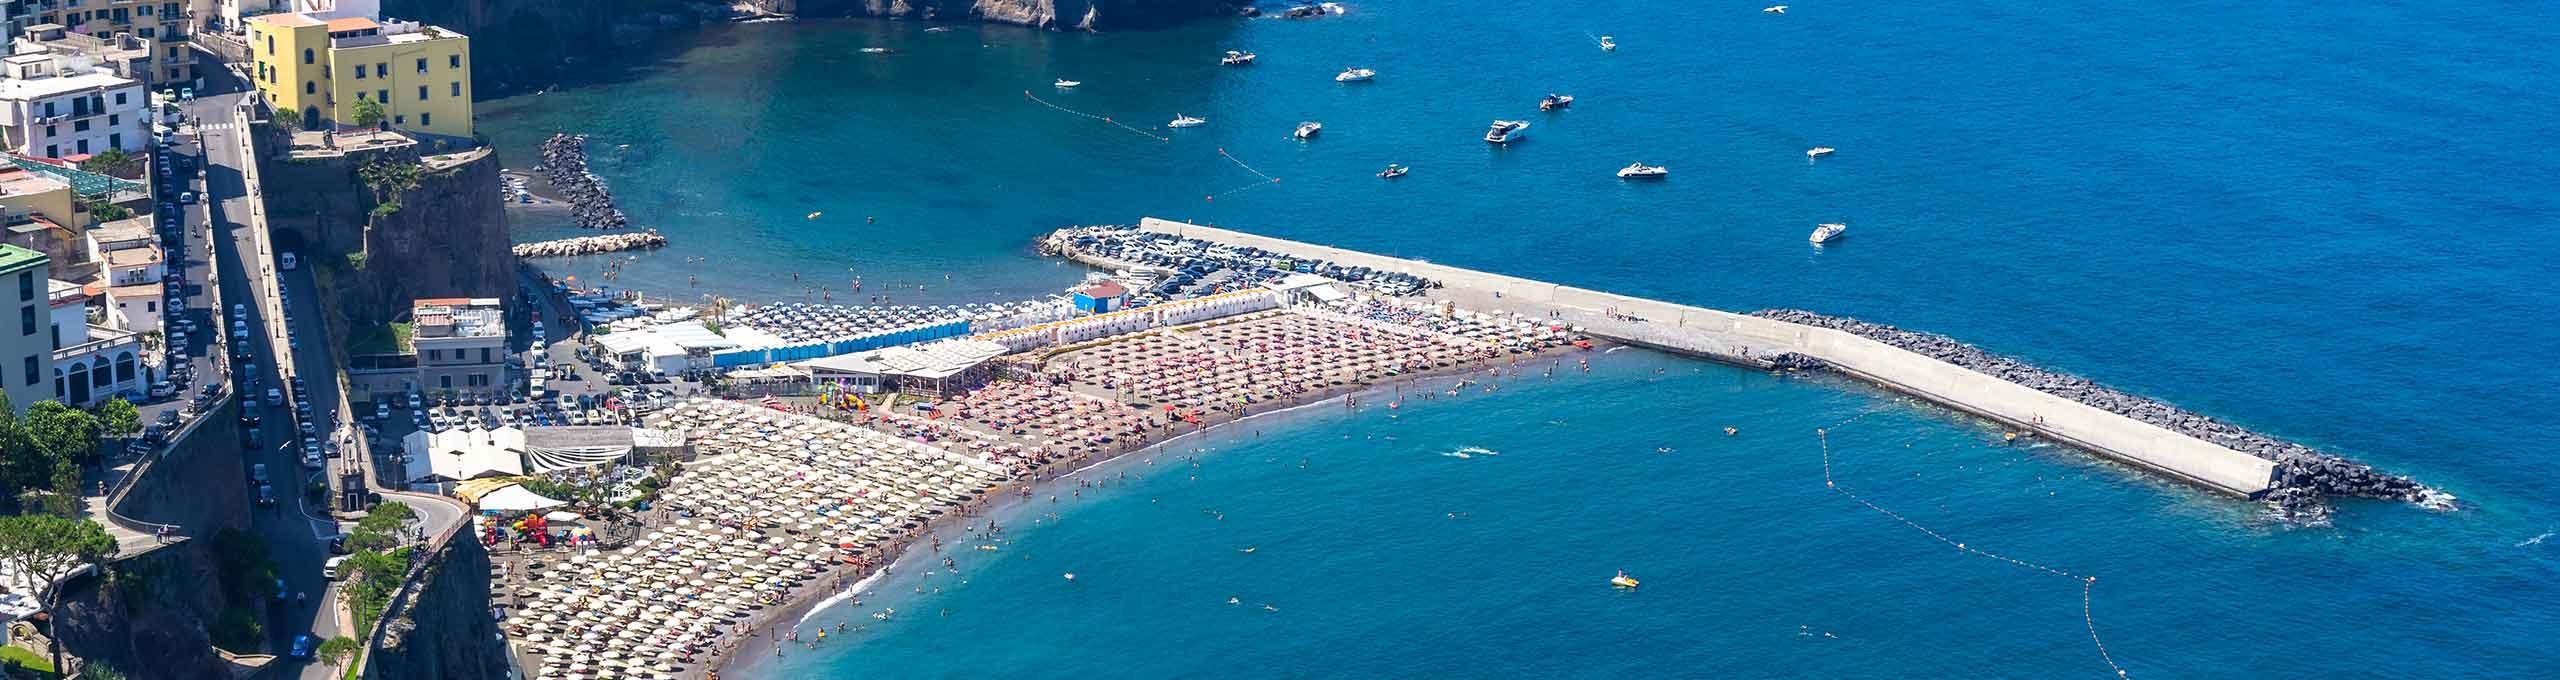 Meta, spiaggia, golfo di Sorrento